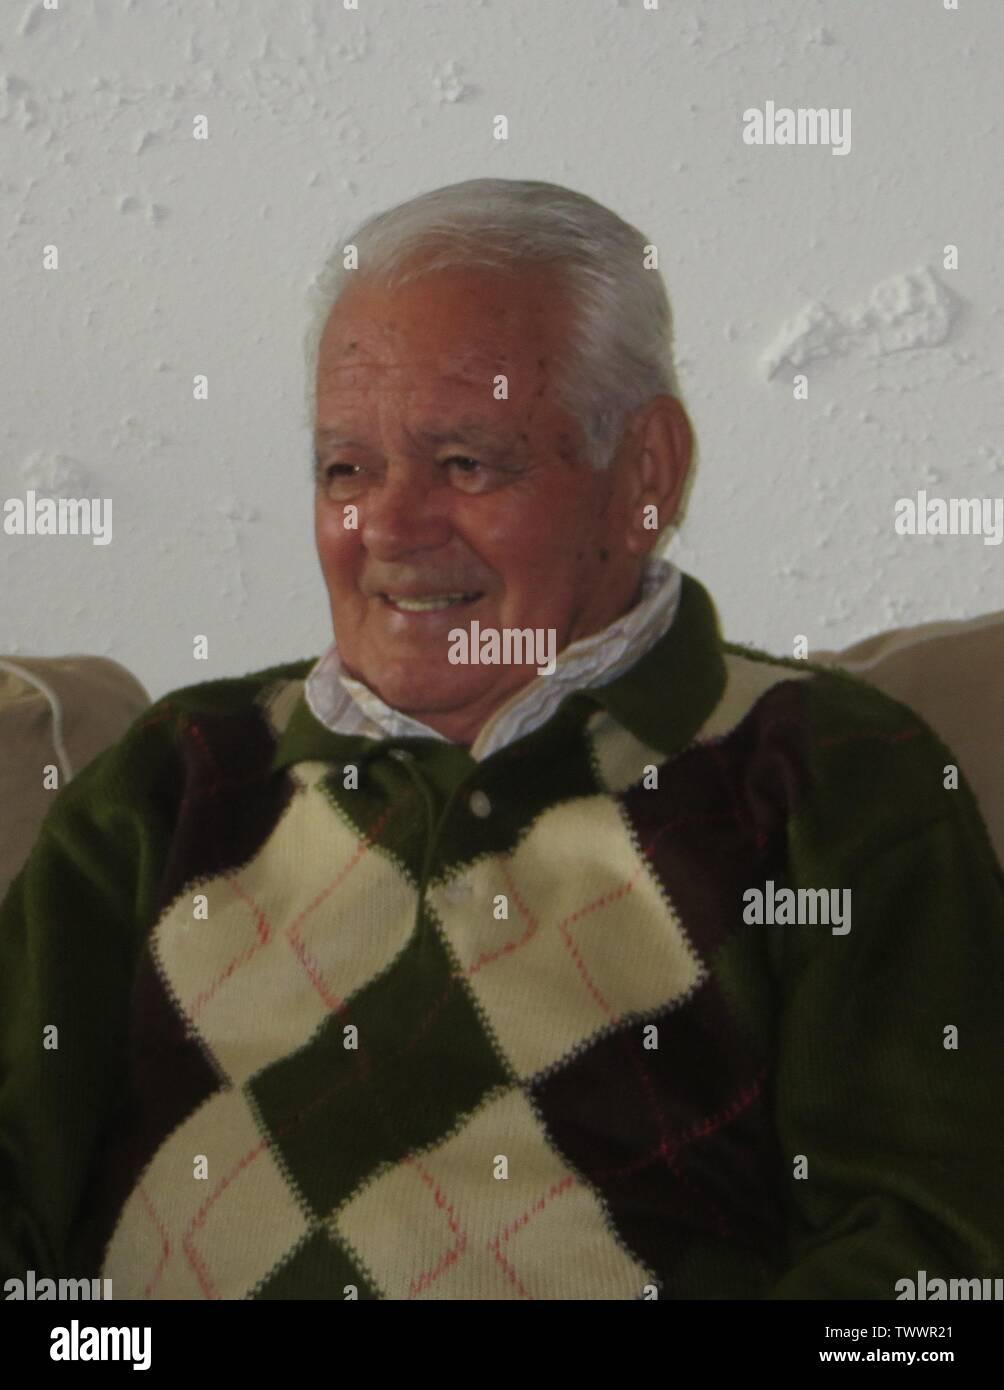 Ð¡Ñ€Ð'Ñки / srpski: Branko Lata; 28 de diciembre de 2014 (fecha de carga original); Transferido de sr.pedia a Commons.; Latasm en Serbio pedia; Foto de stock